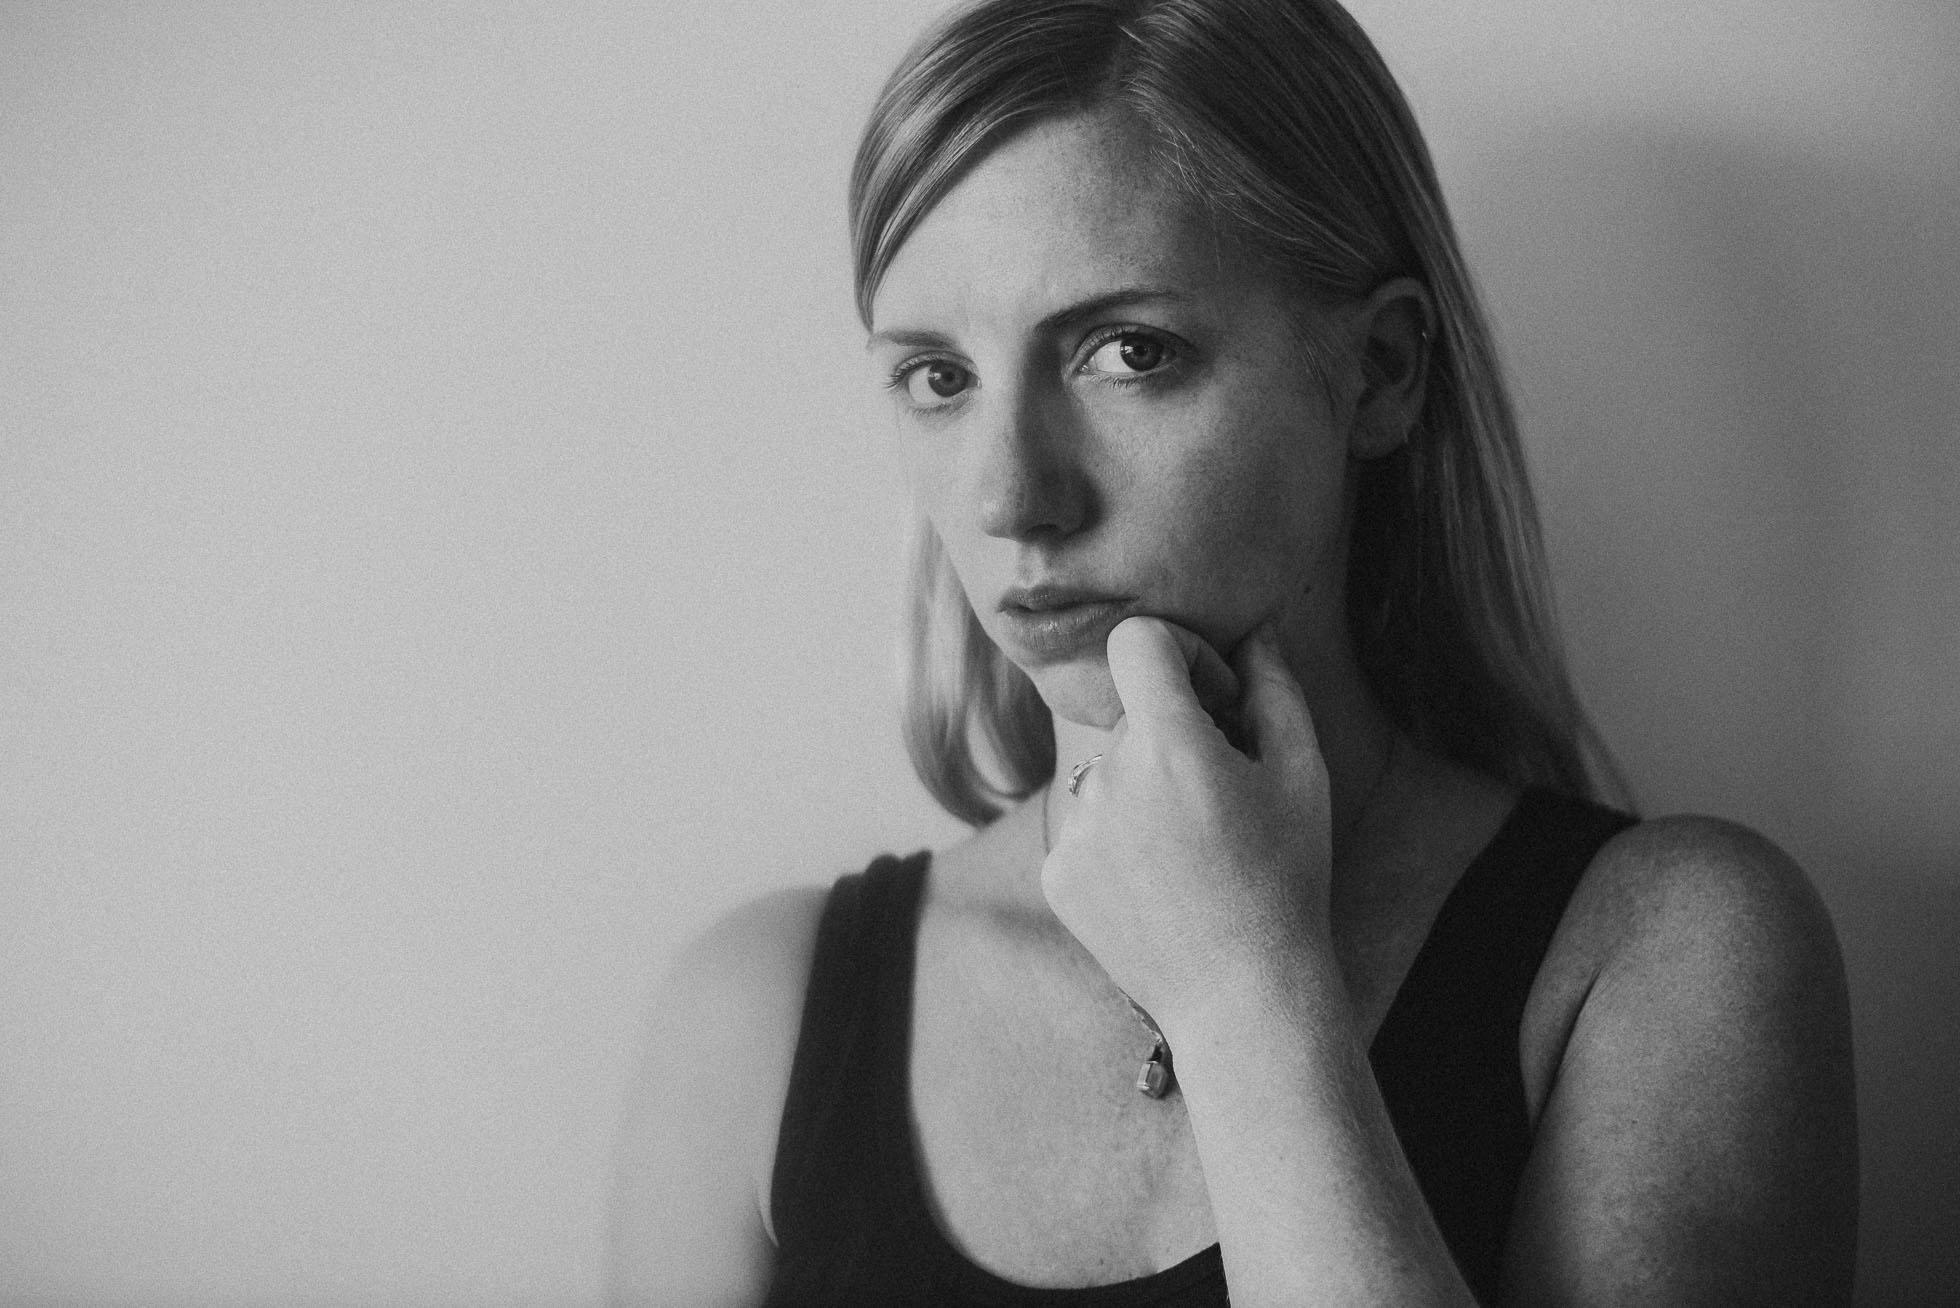 self-portrait-black-and-white-photography.jpg